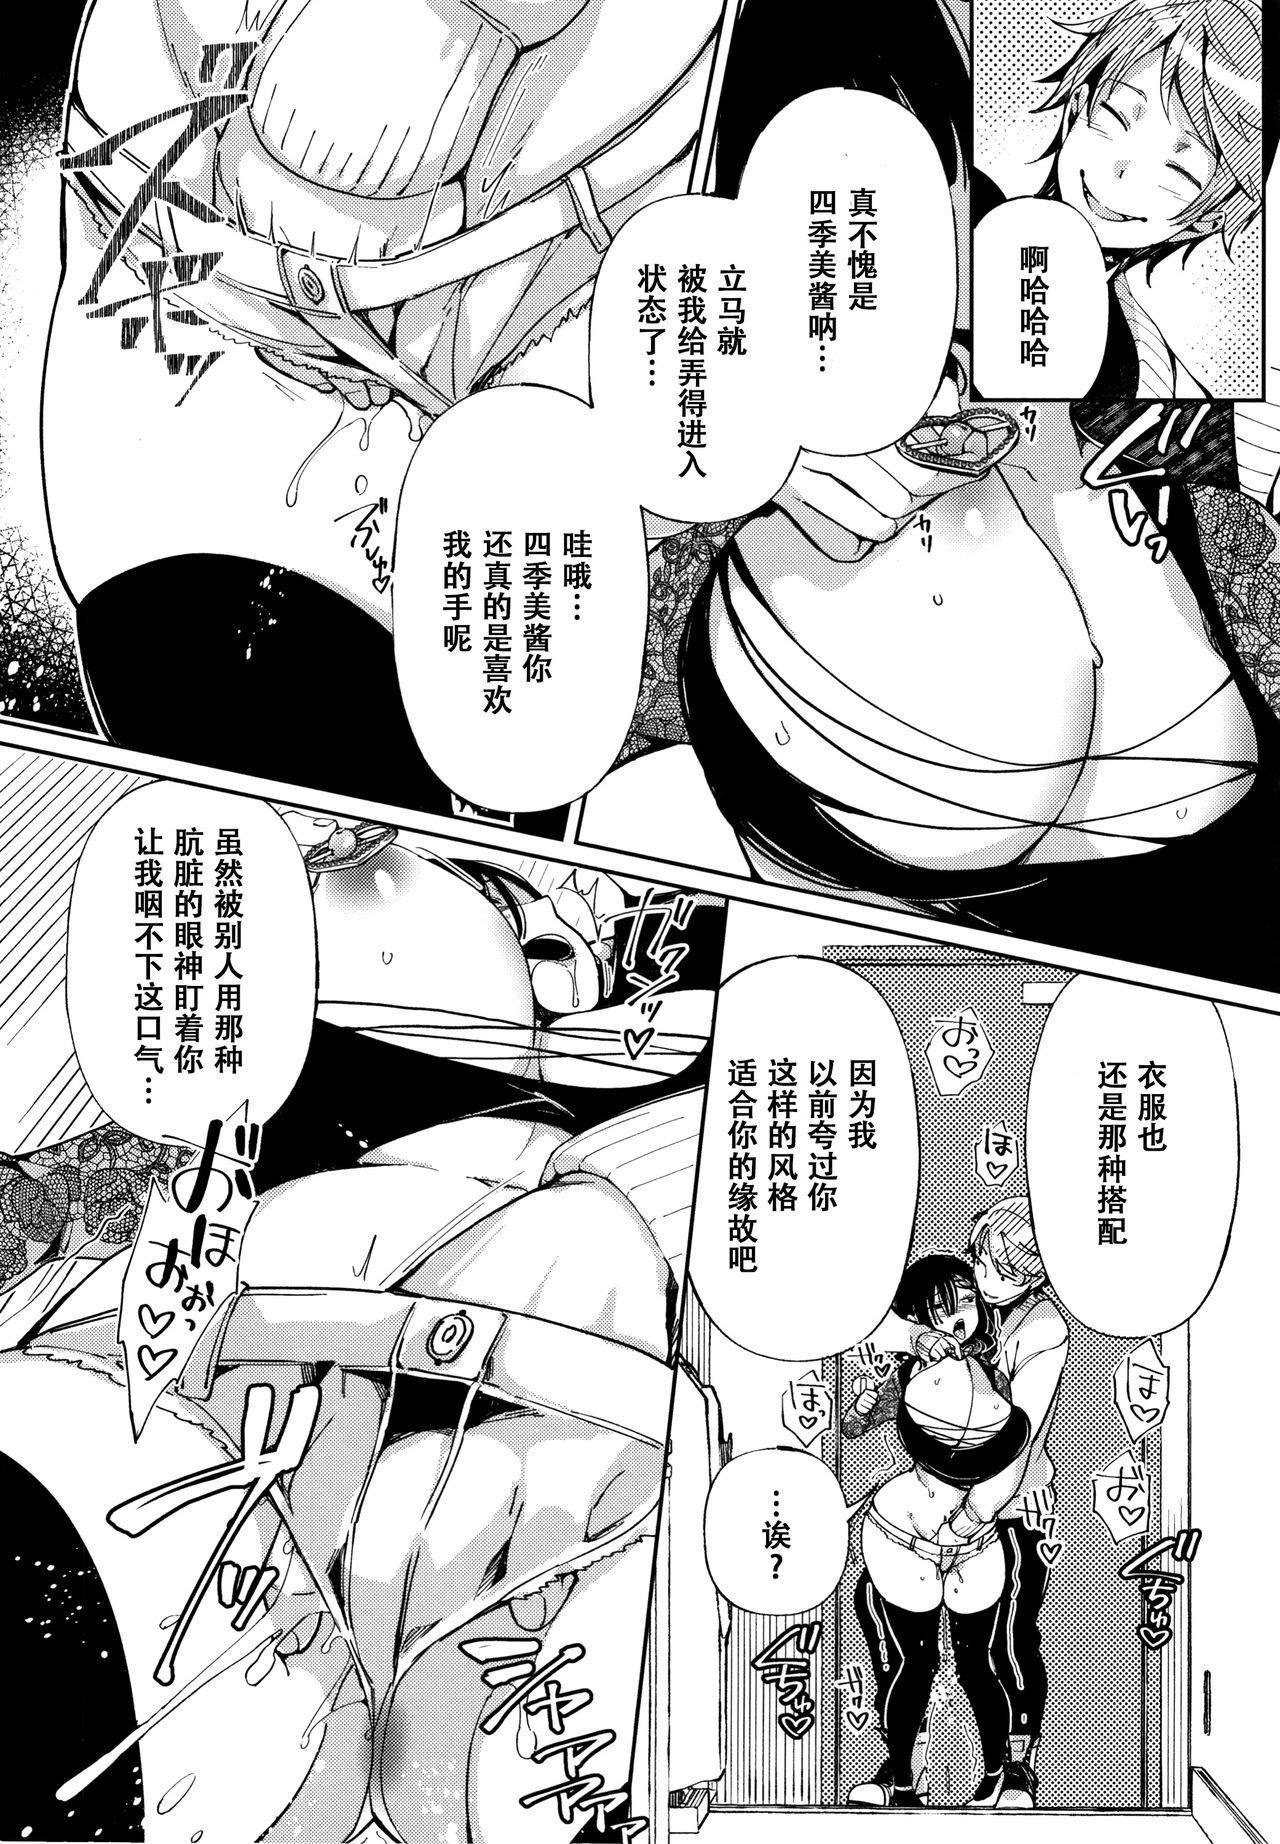 [Achumuchi] Saijaku Gal wa Ikizurai! - The weakest pussy is hard to go.ch.1-8 [Chinese] [战栗的玻璃棒汉化] [Ongoing] 132